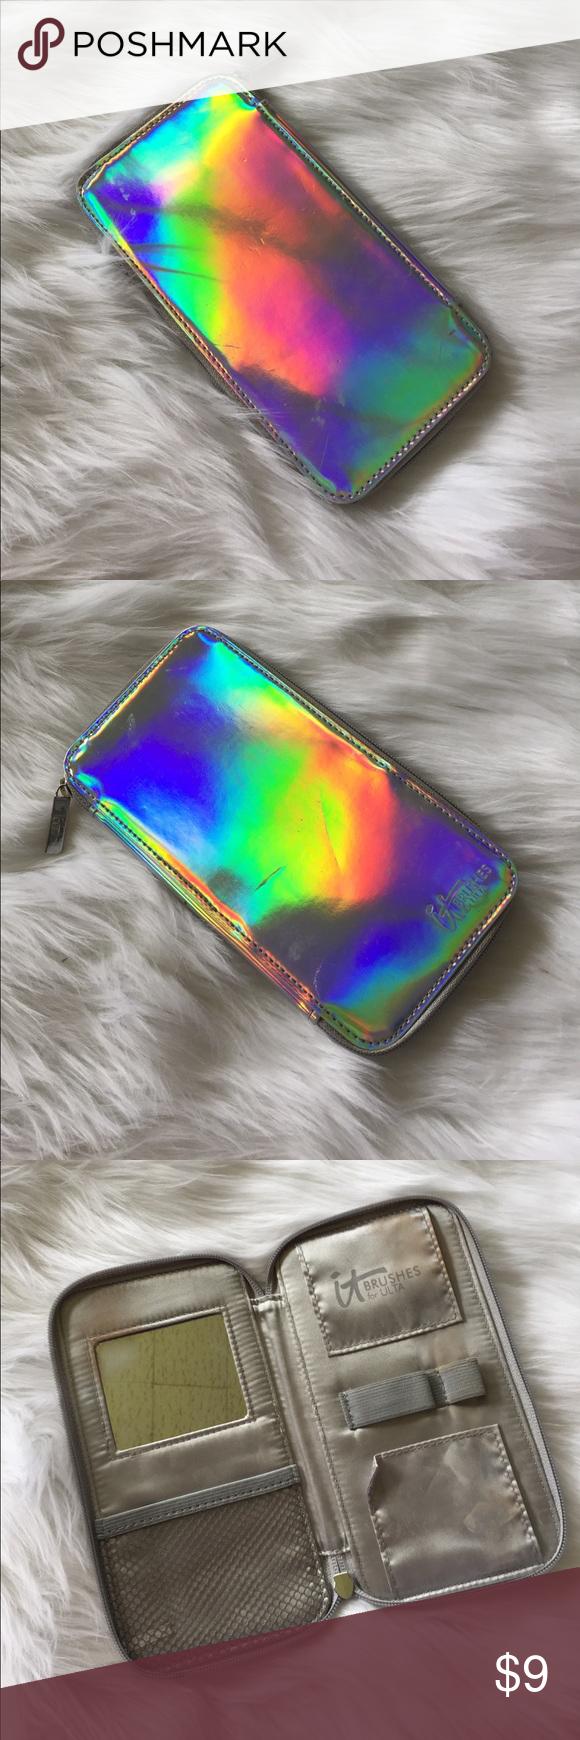 ️ Holographic Cosmetic Brush Case It cosmetics brushes